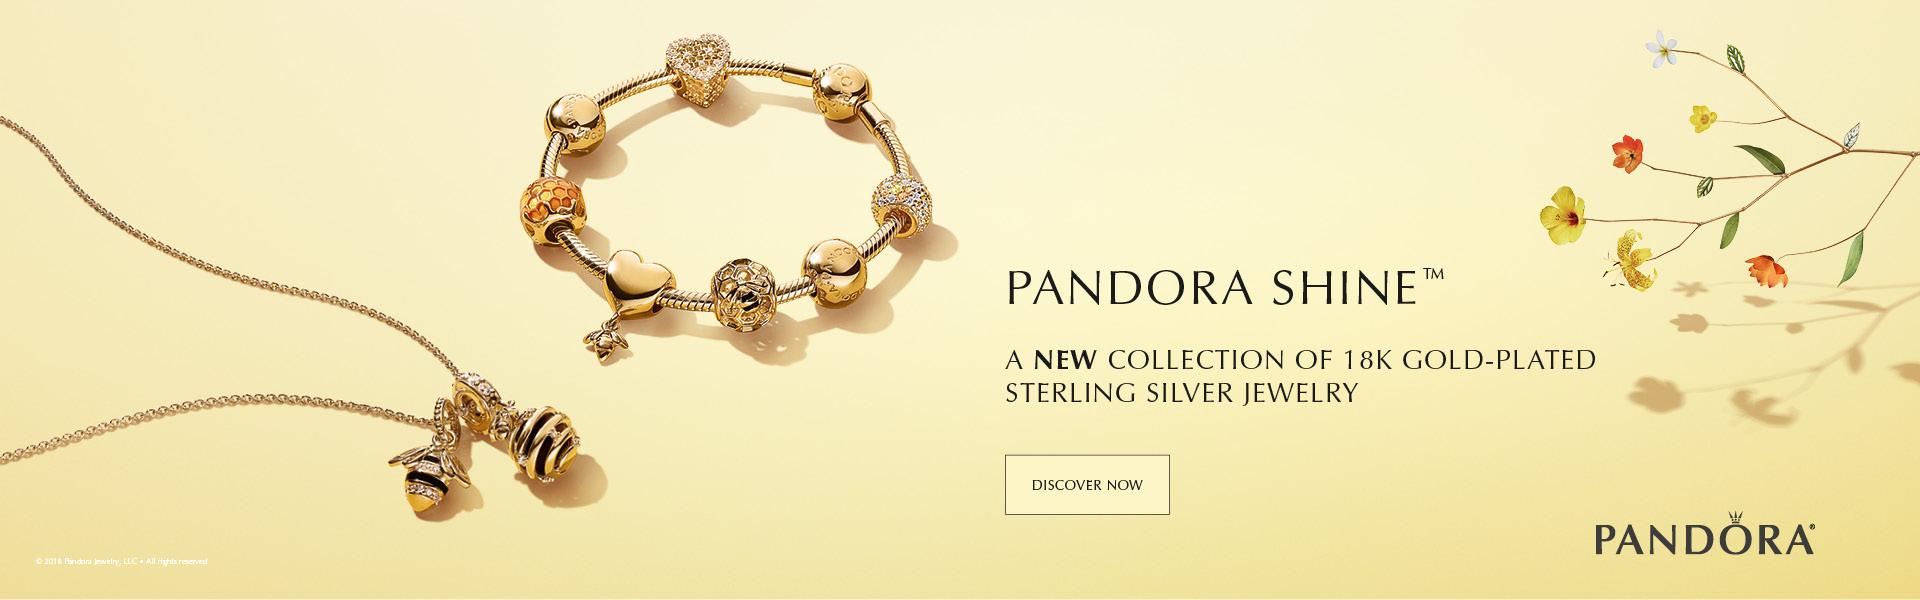 pandora charms 60453